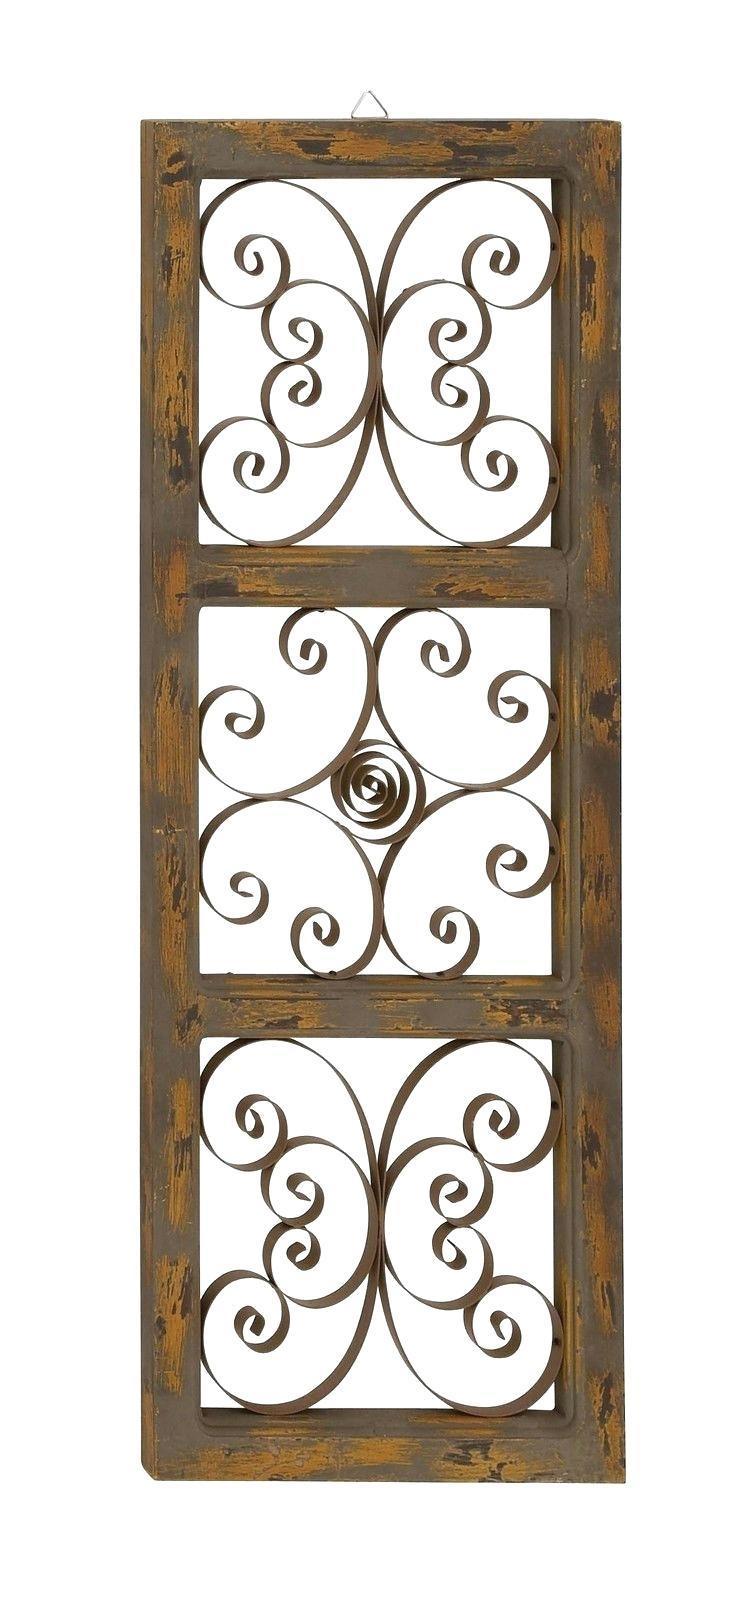 20 ideas of iron scroll wall art wall art ideas. Black Bedroom Furniture Sets. Home Design Ideas